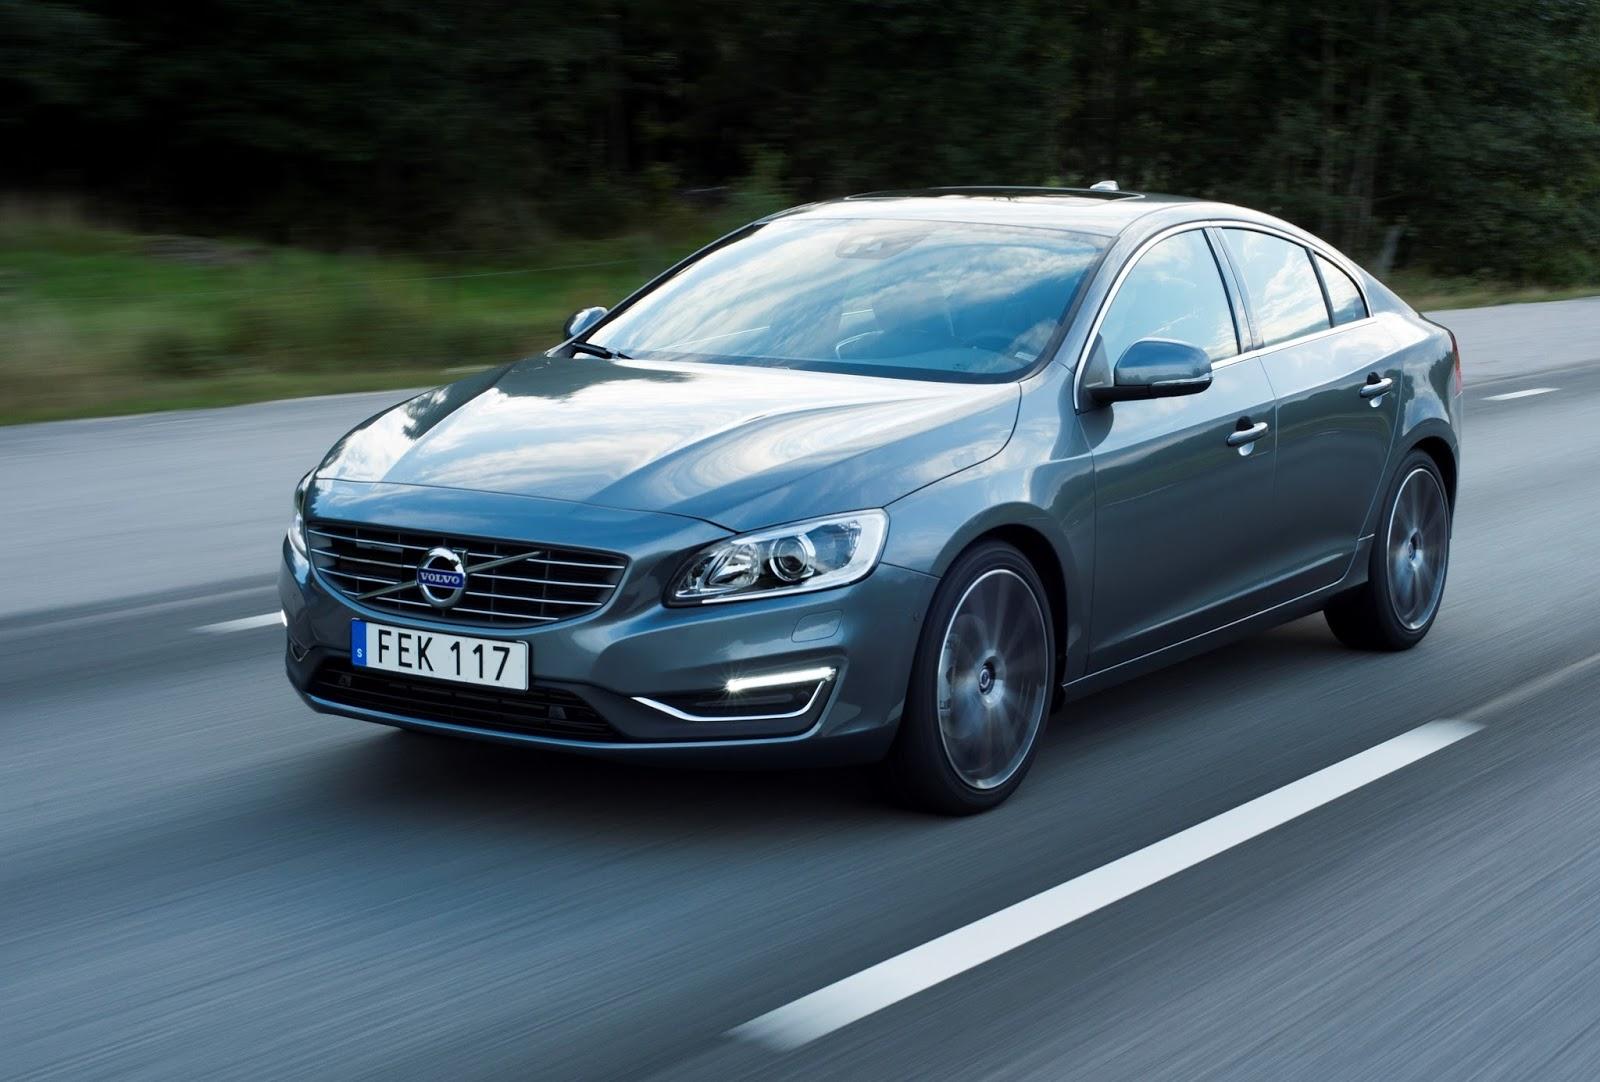 VOLVO2BS60 Εν μέσω κρίσης η Volvo χτυπάει κορυφή Volvo S60, Volvo V40, Volvo V40 Cross Country, Volvo V60, Volvo XC60, Volvo XC90